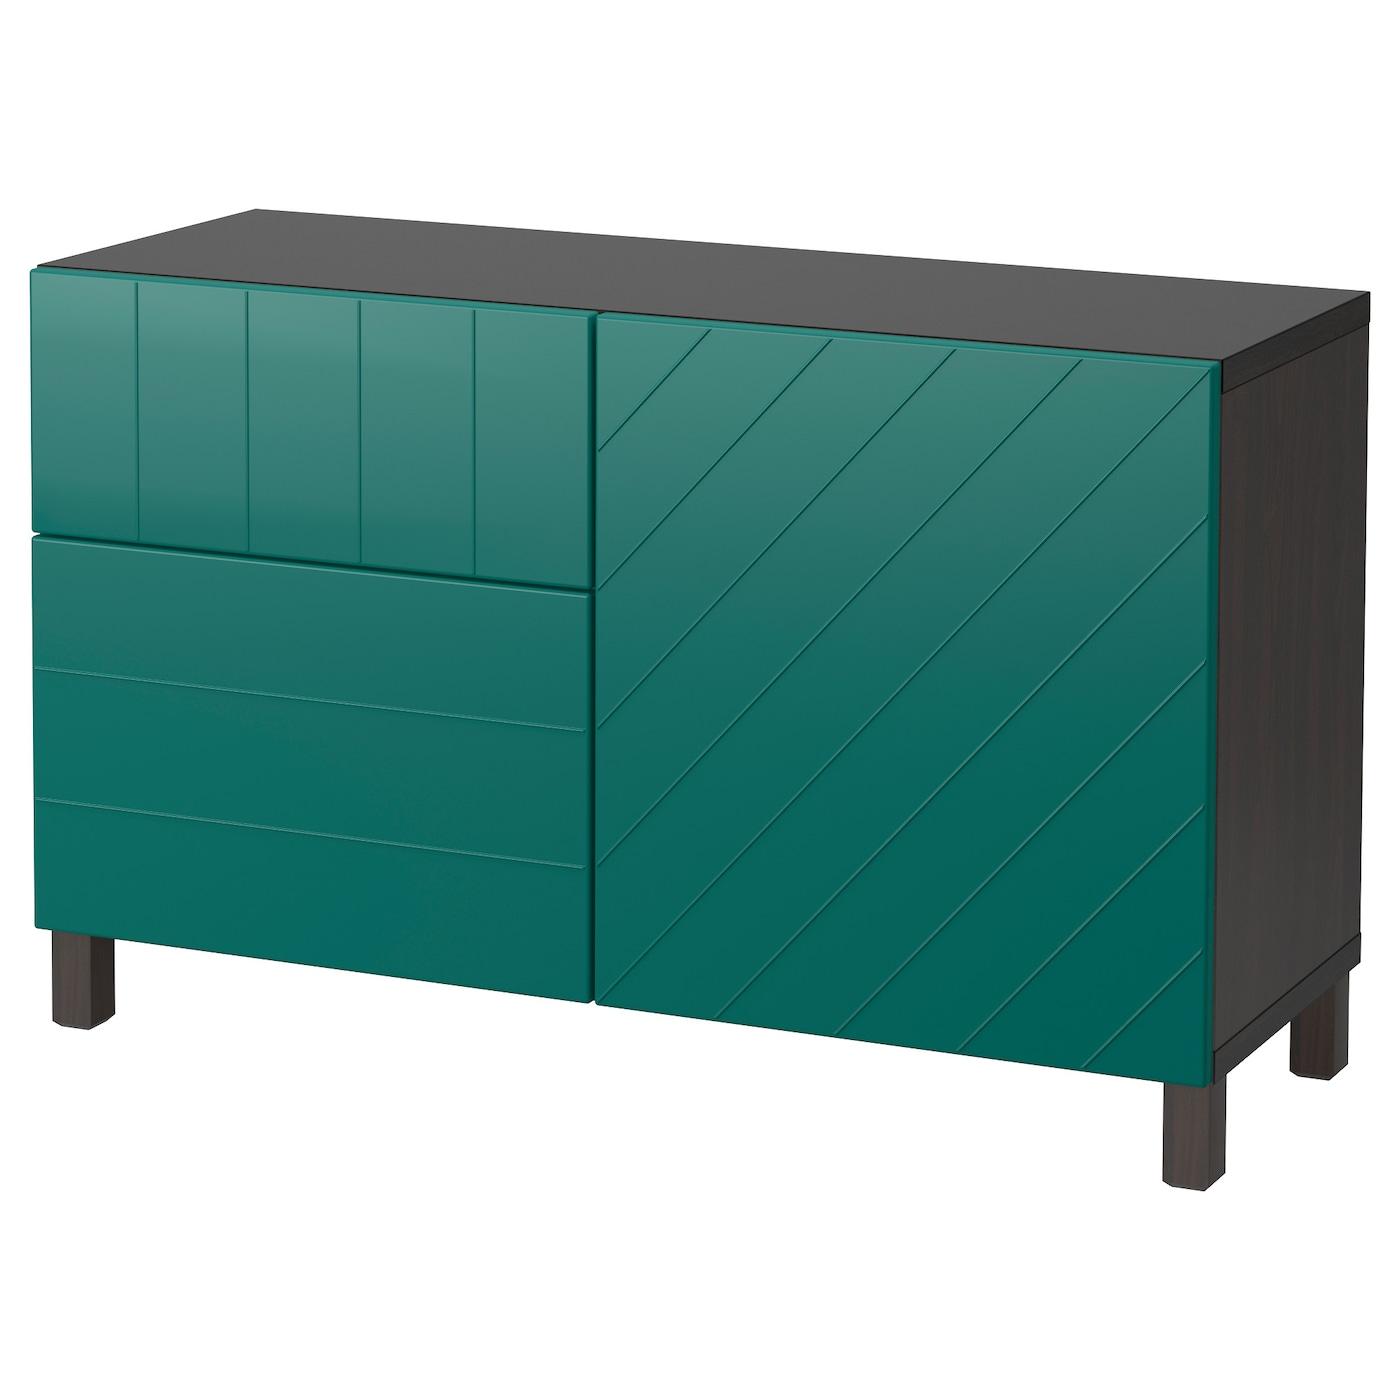 best combi rgt portes tiroirs brun noir hallstavik bleu vert 120x40x74 cm ikea. Black Bedroom Furniture Sets. Home Design Ideas